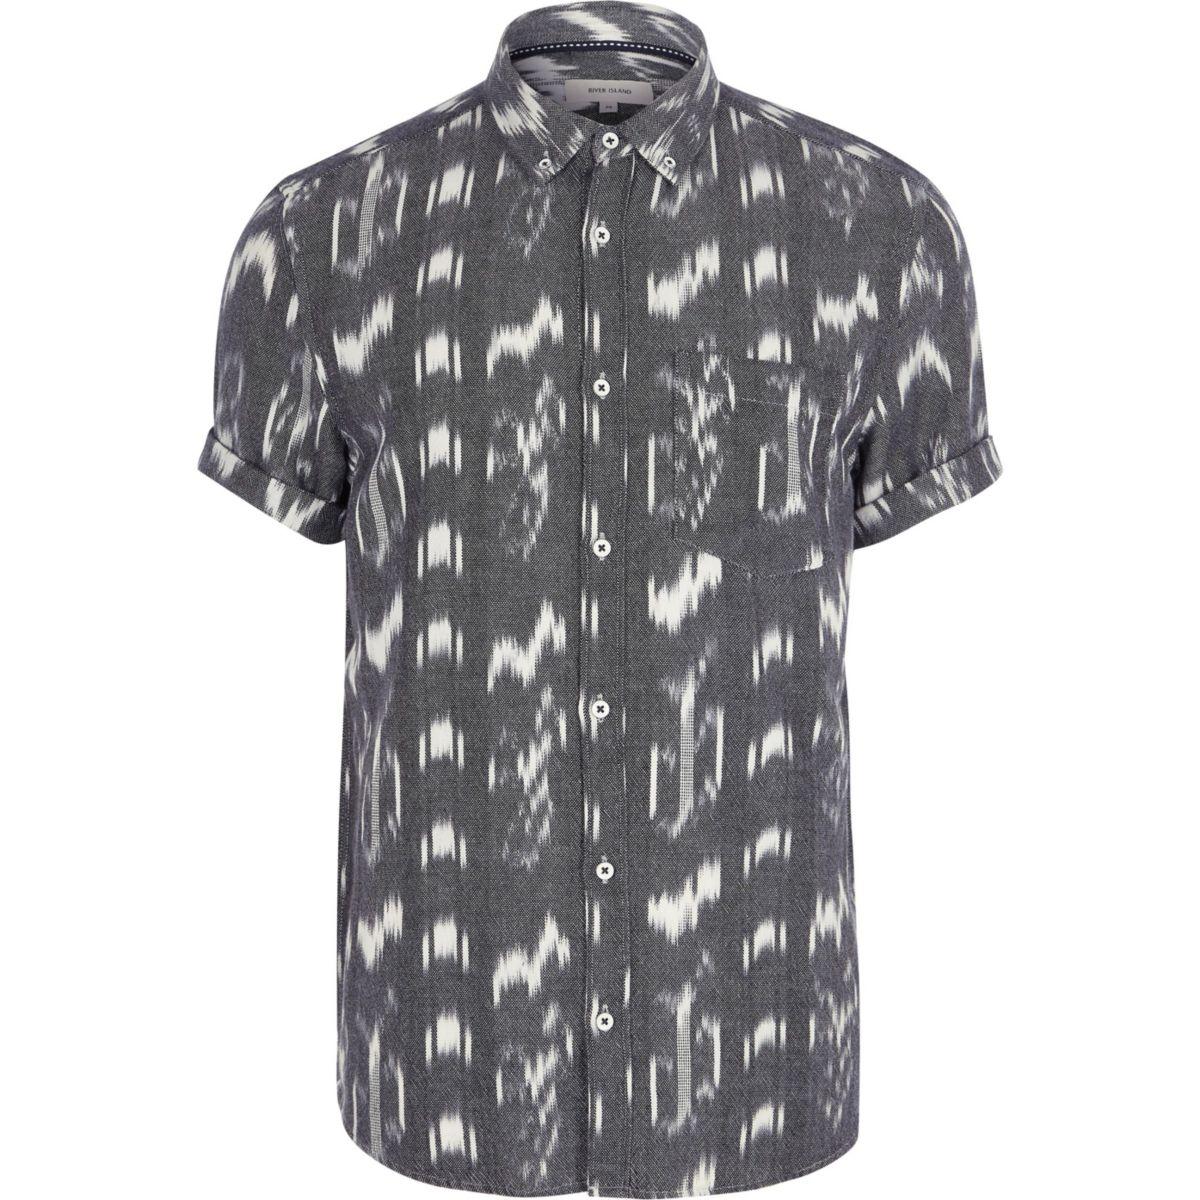 Grey ikat slim fit short sleeve shirt